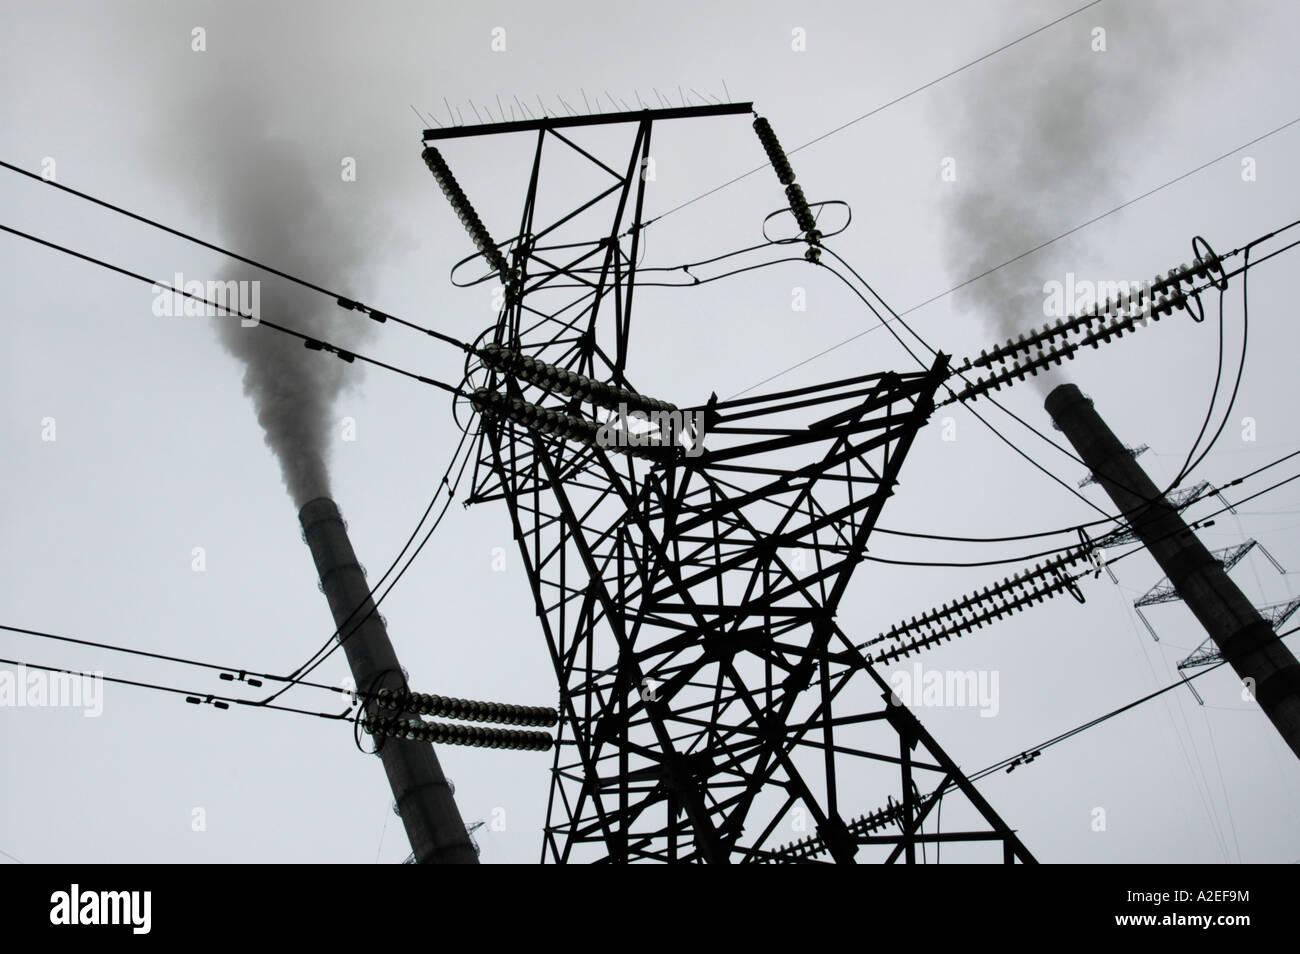 Smoke Stacks High Tension Poles Stock Photo 10498207 Alamy